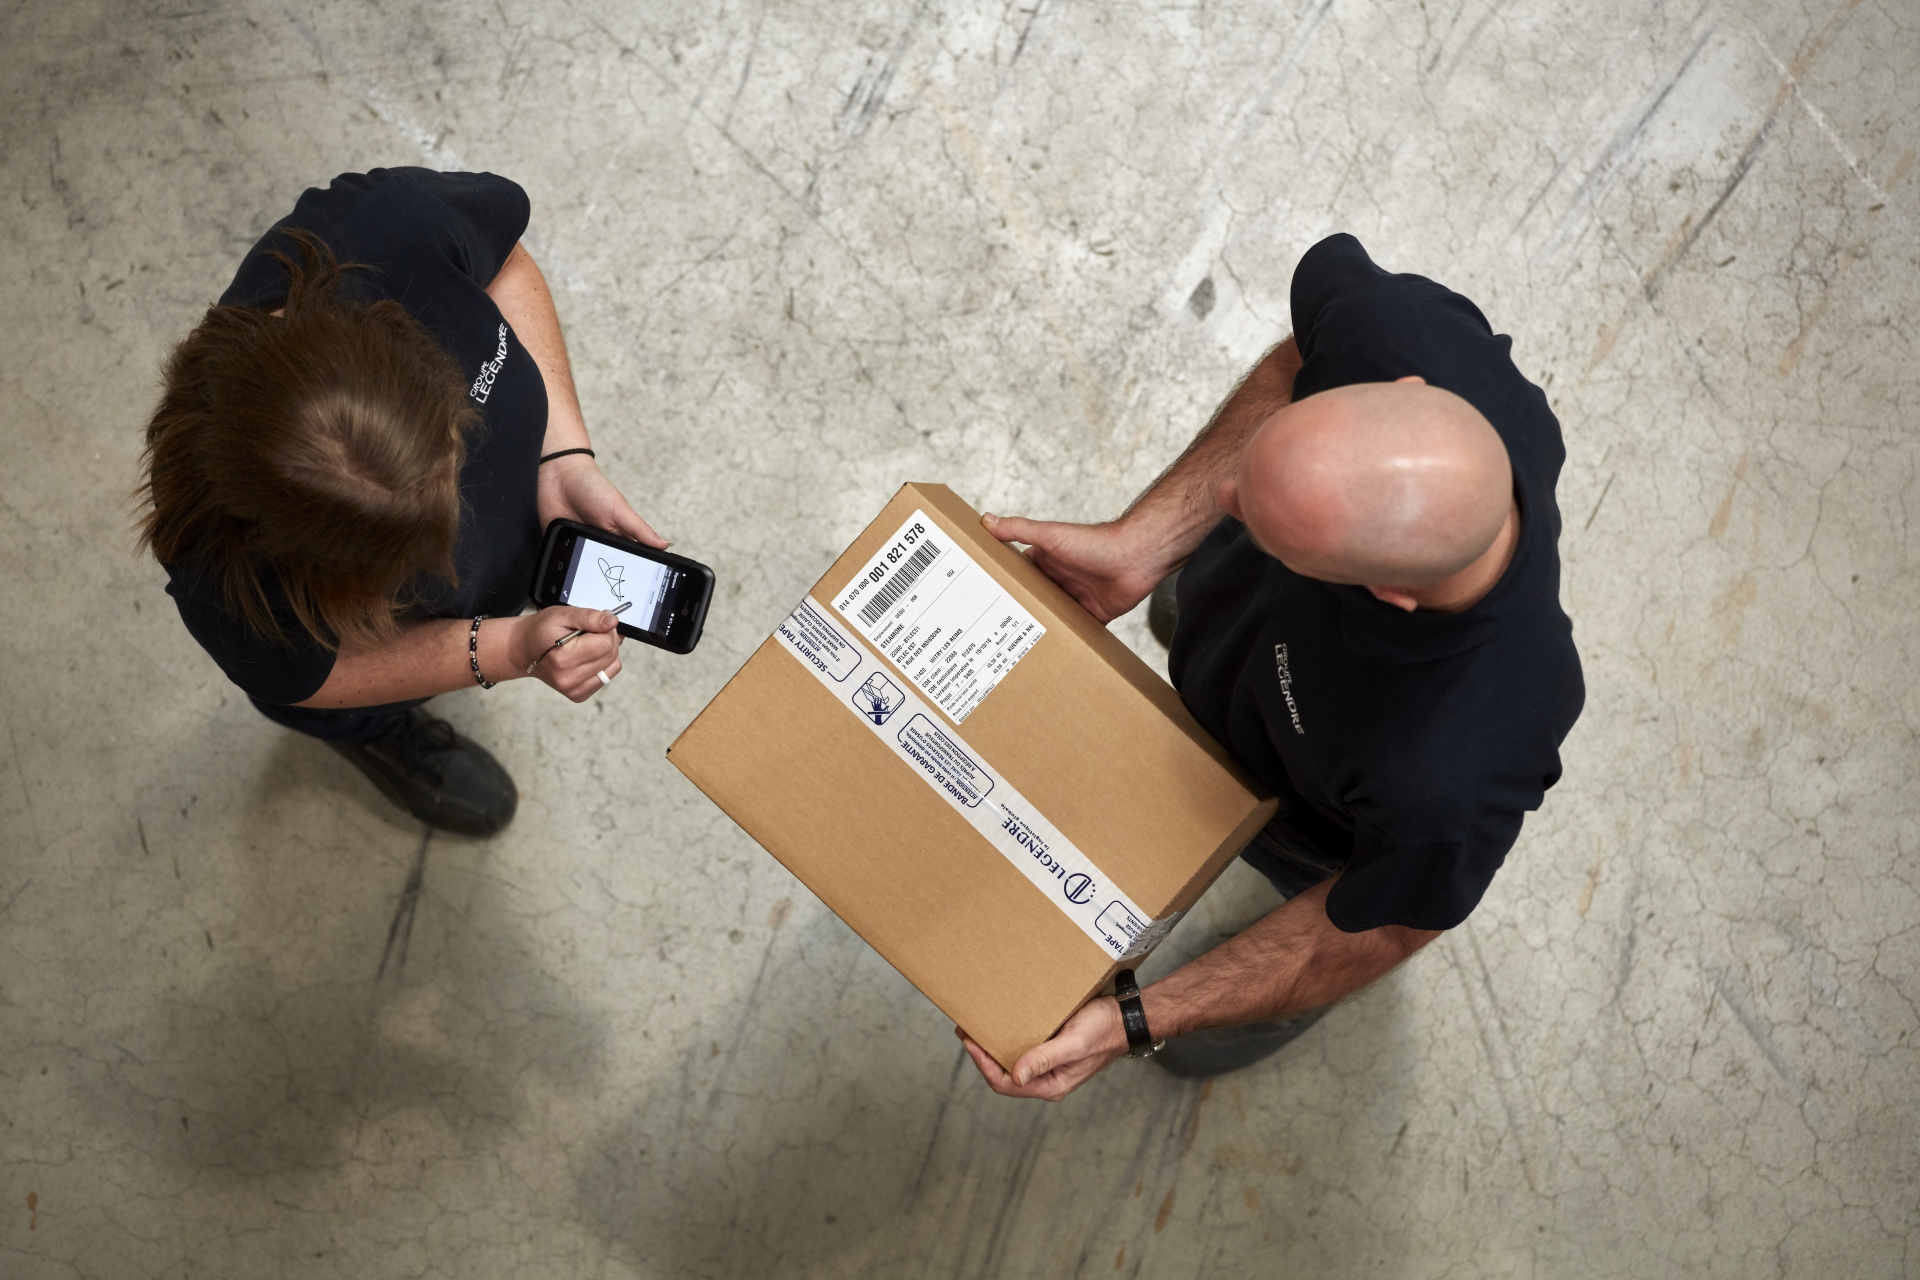 Image gauche - Logistique & stockage